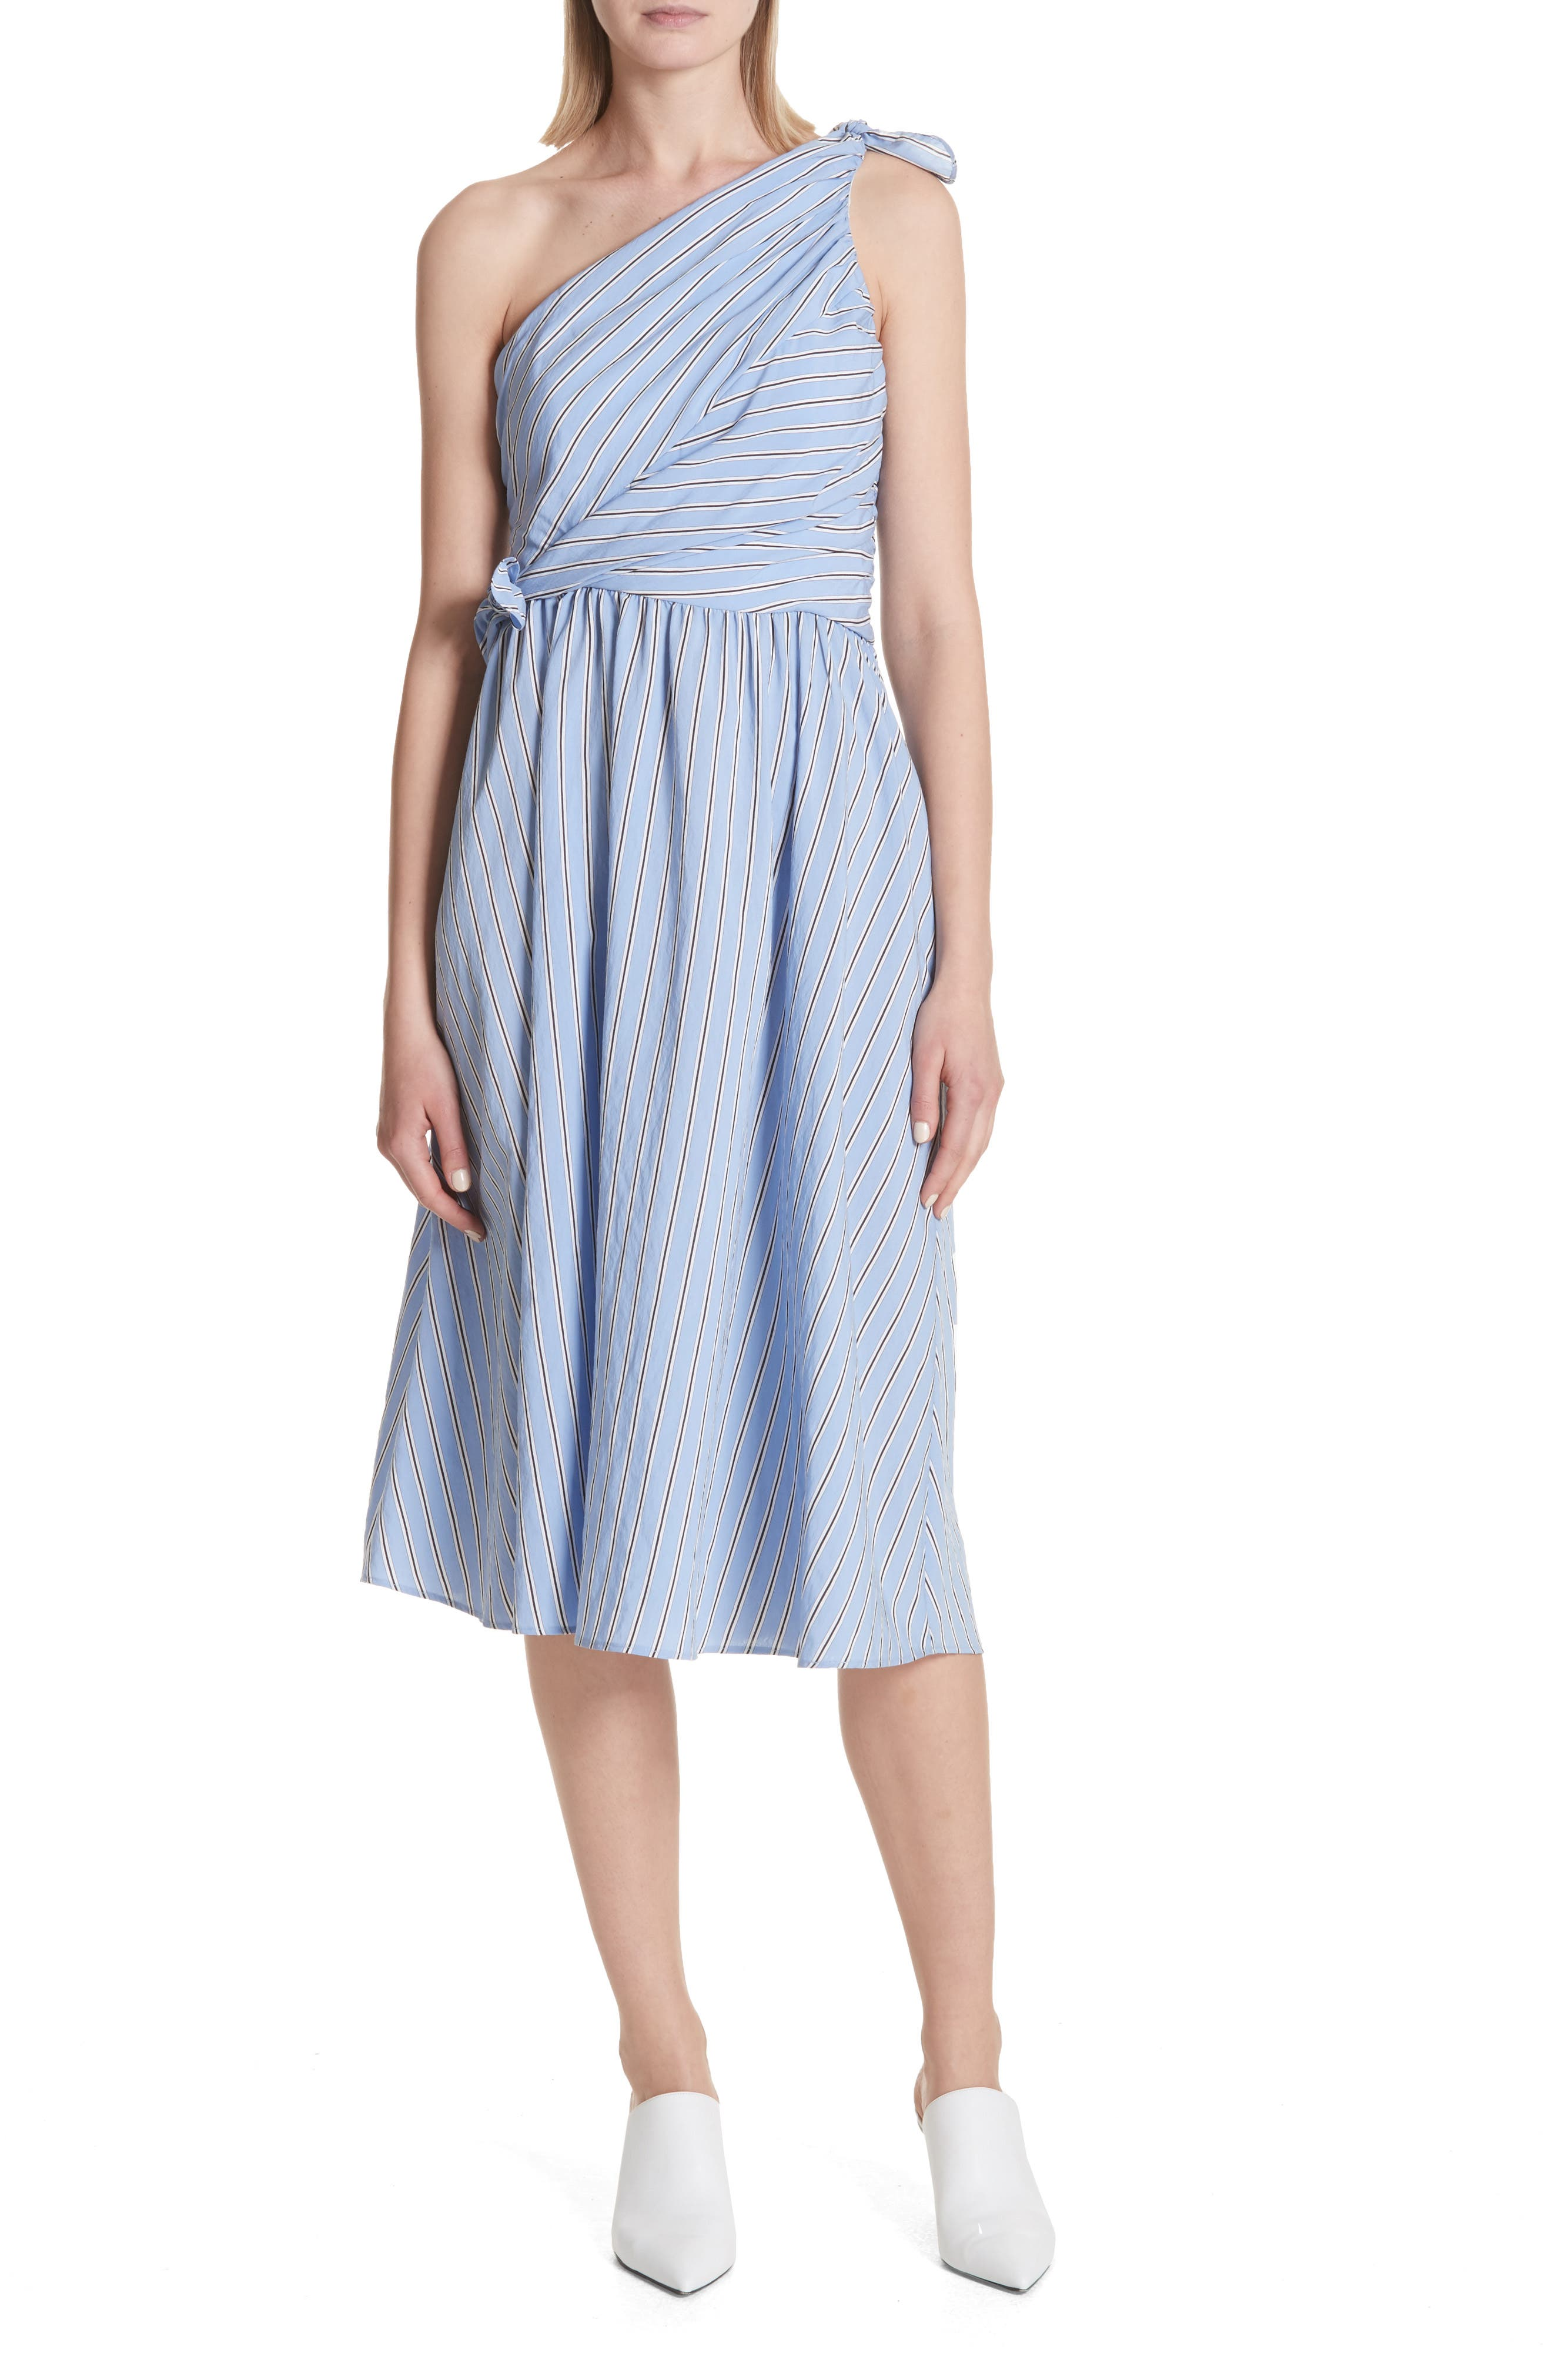 Cabrera Stripe One-Shoulder Dress,                             Main thumbnail 1, color,                             Olxford Blue